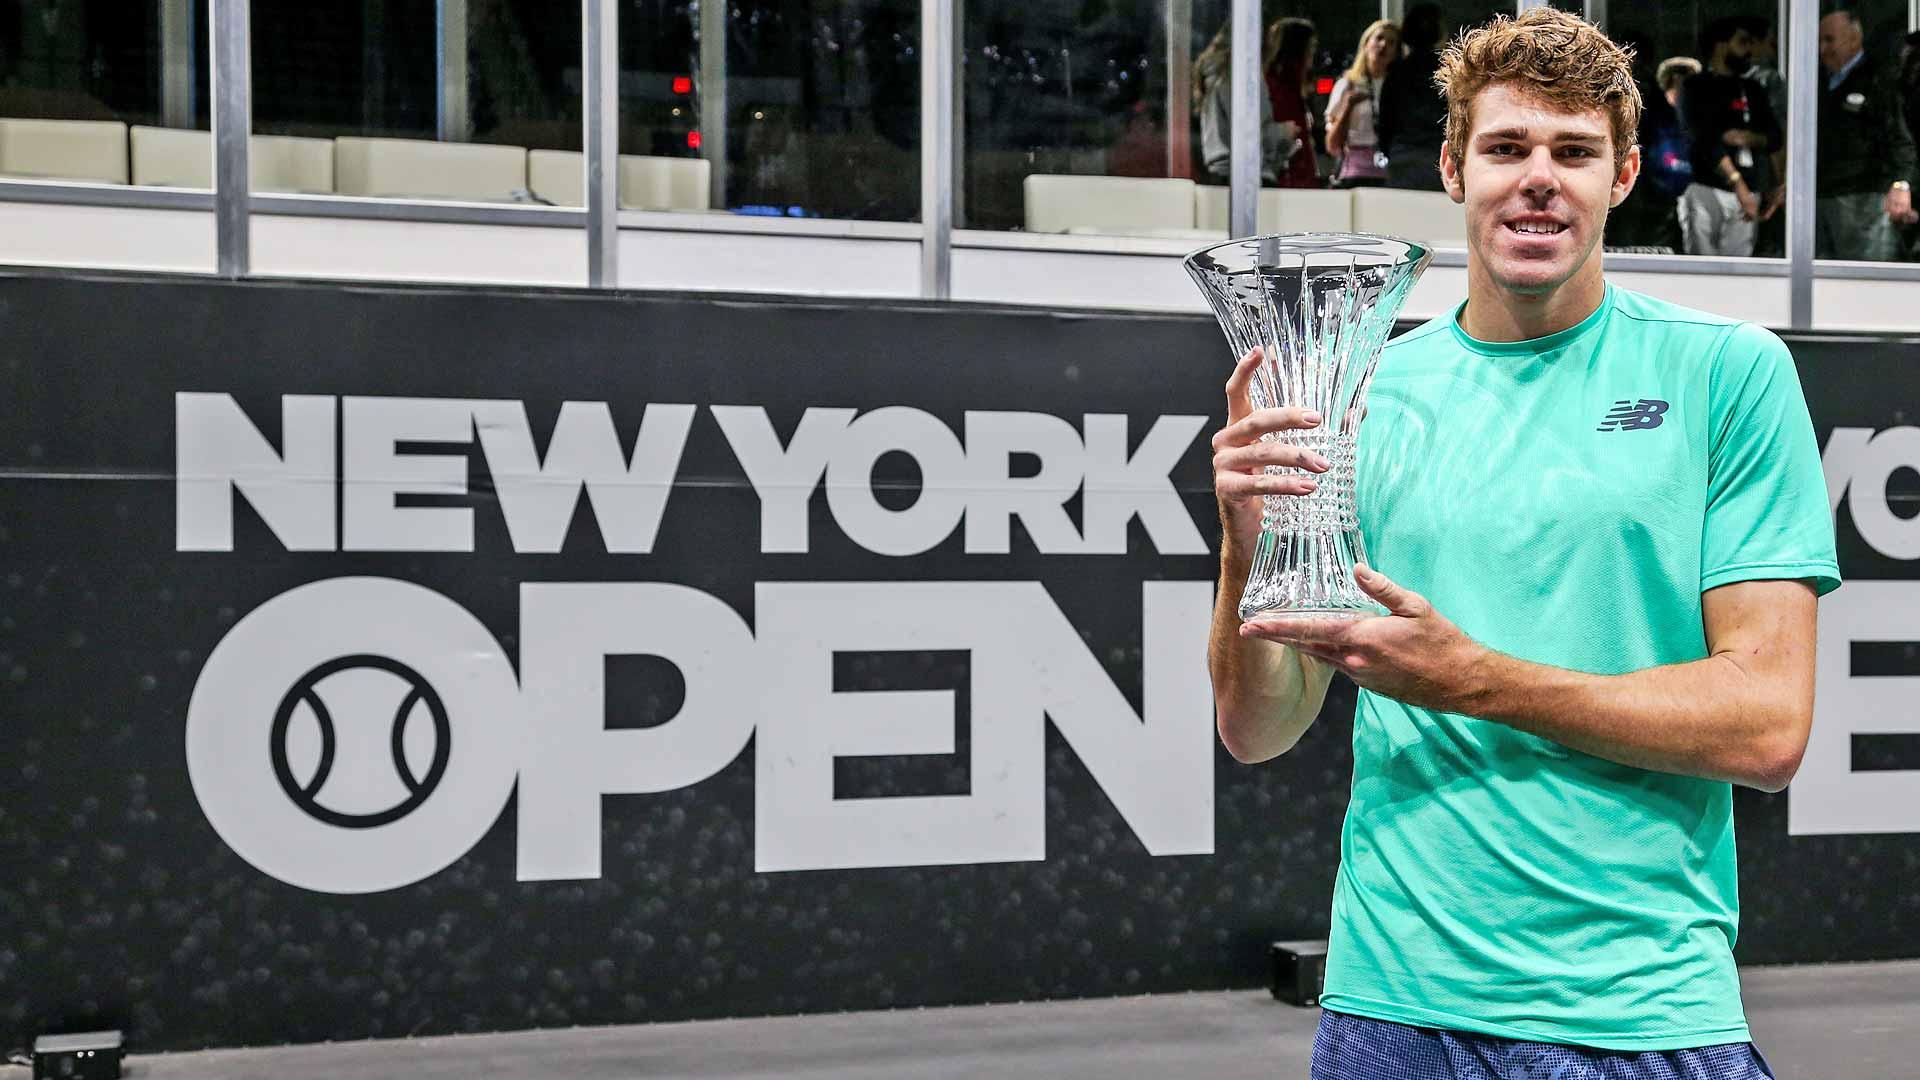 Opelka Wins 2019 New York Open